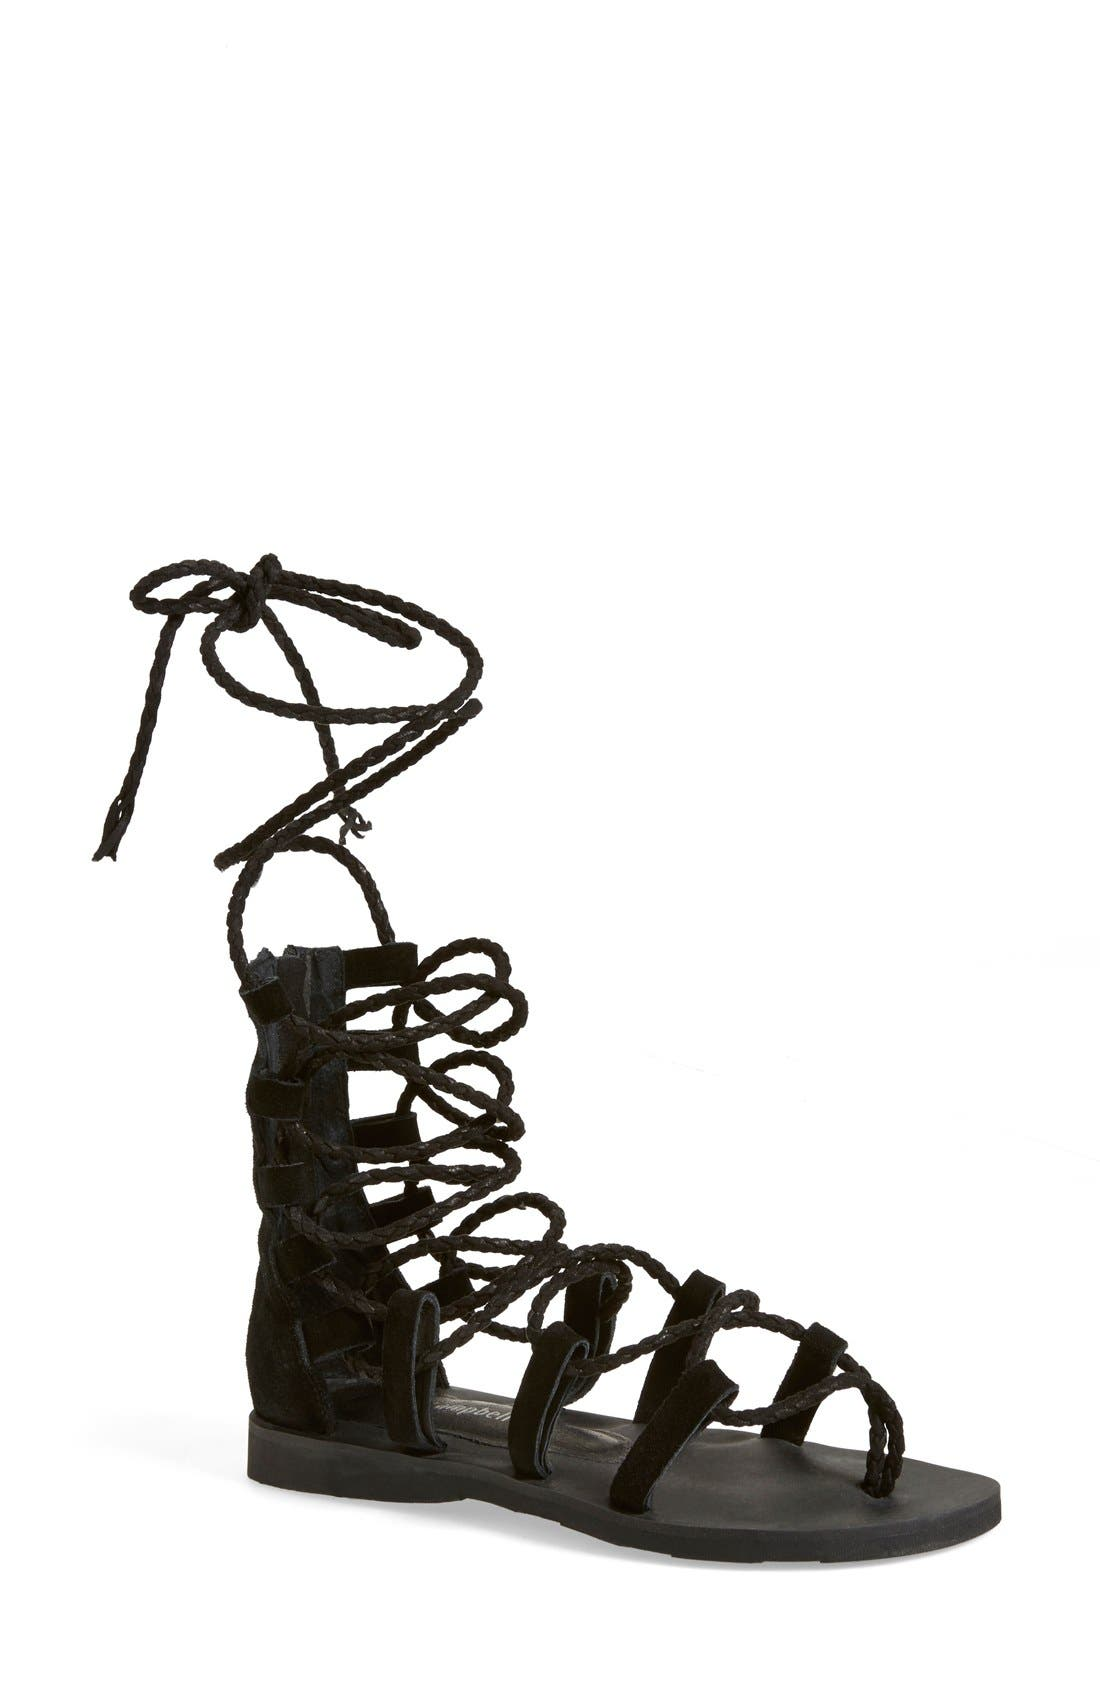 'Hola' Lace-Up Gladiator Sandal,                             Main thumbnail 1, color,                             001